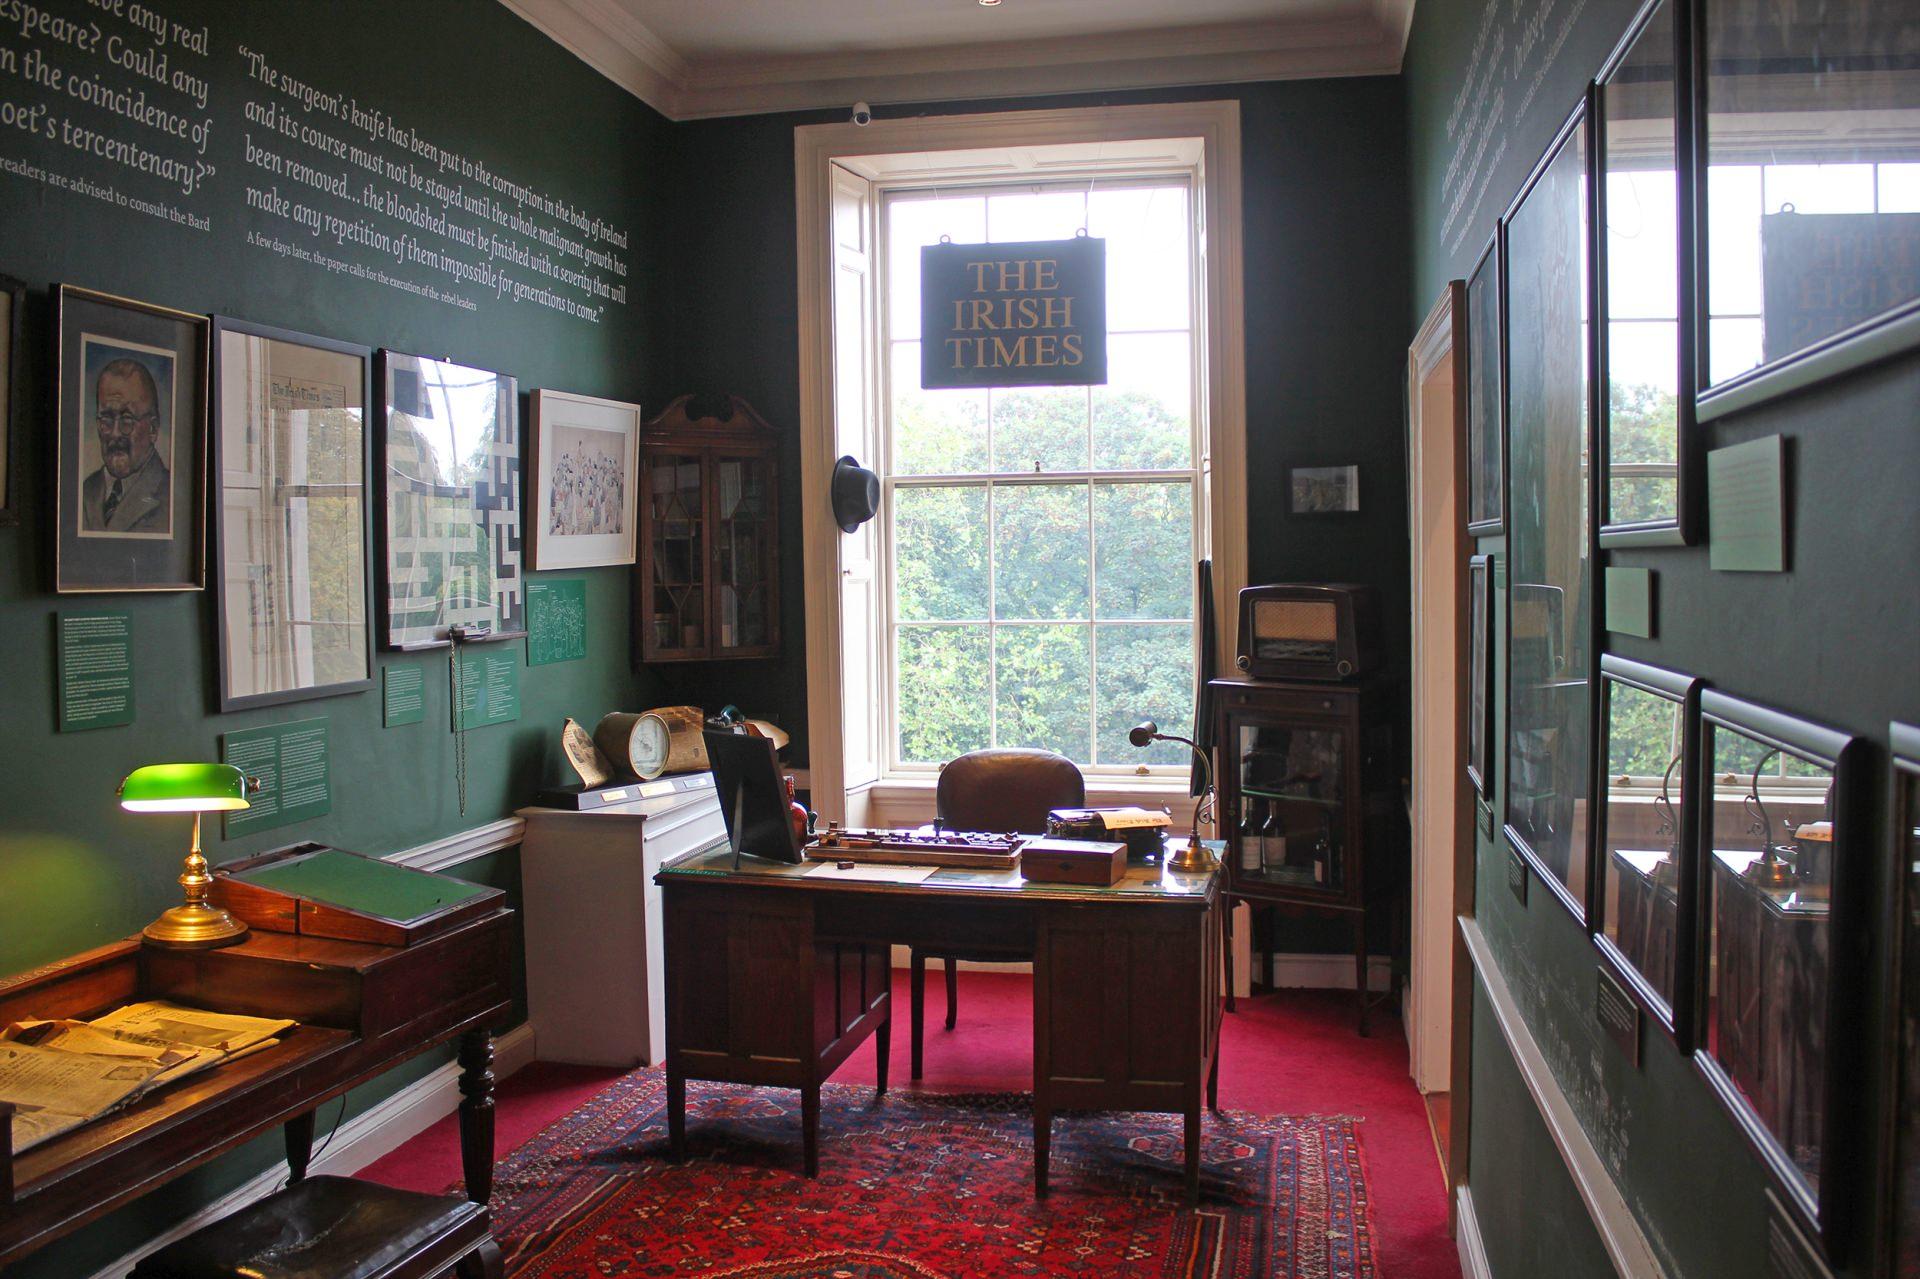 little museum irish times raum